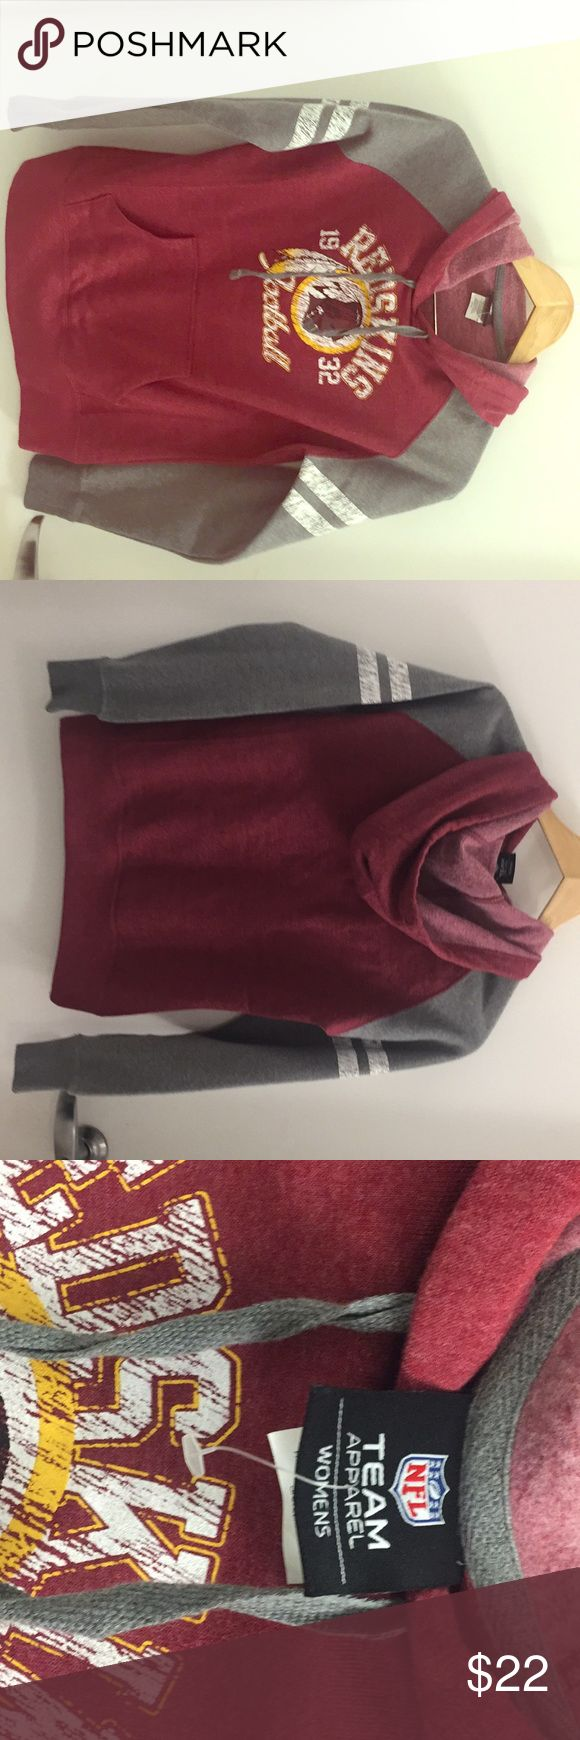 Women's Redskins Hoodie (Size S ) NFL Apparel redskins Hoodie for women NFL Sweaters